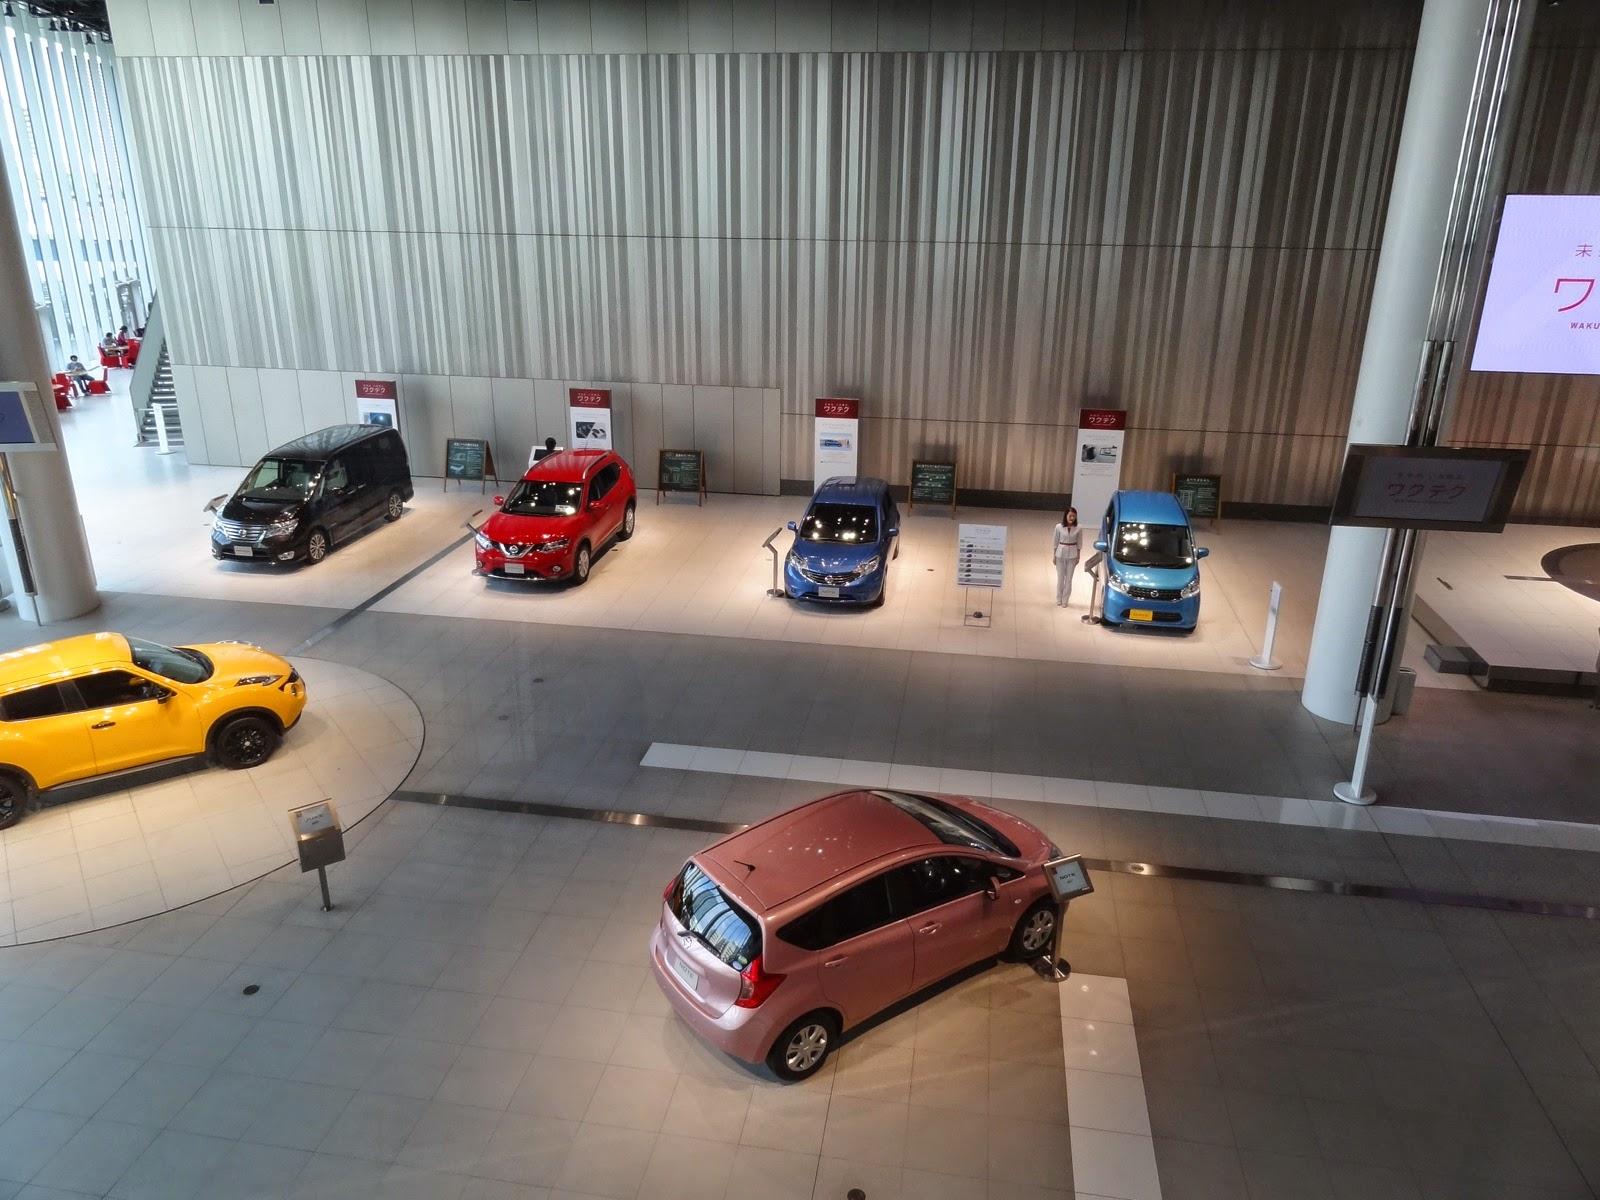 Passed through Nissans world headquarters